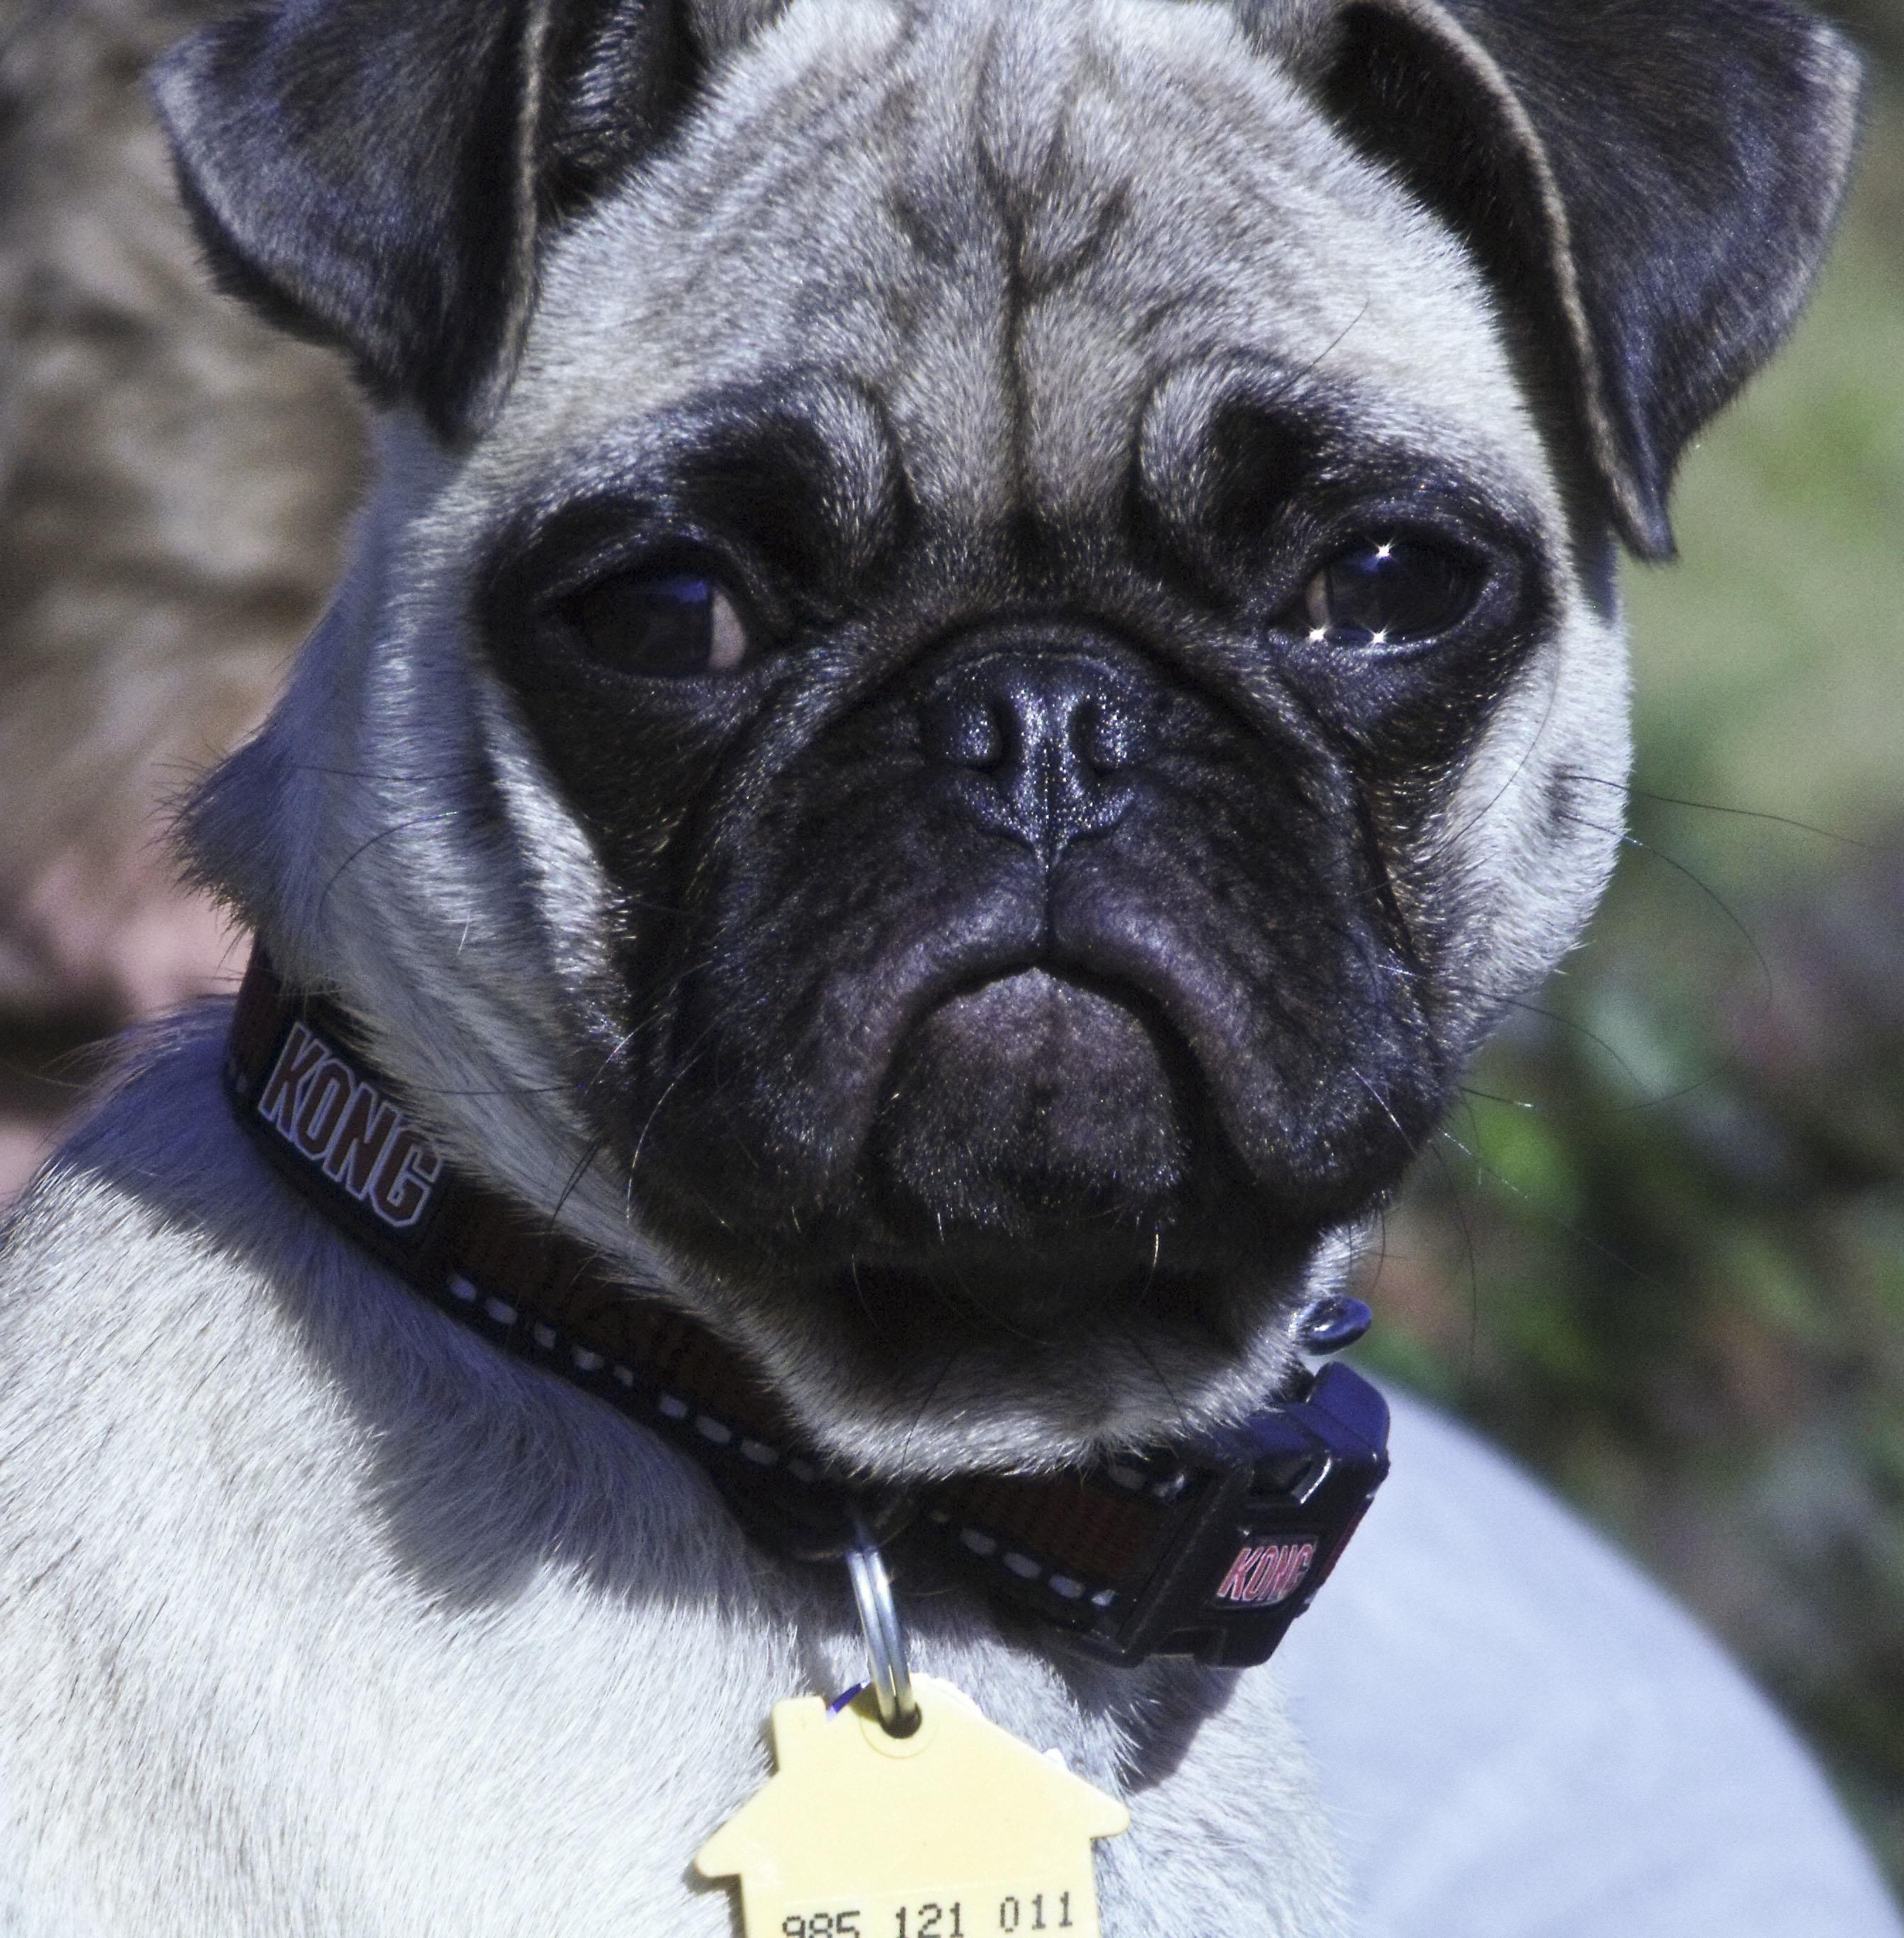 Best New Cars Under 15k Australia >> Bentley Bulldog.English Bulldog Dog Breed Information Buying Advice . Pugs. Pugs - Car Images ...